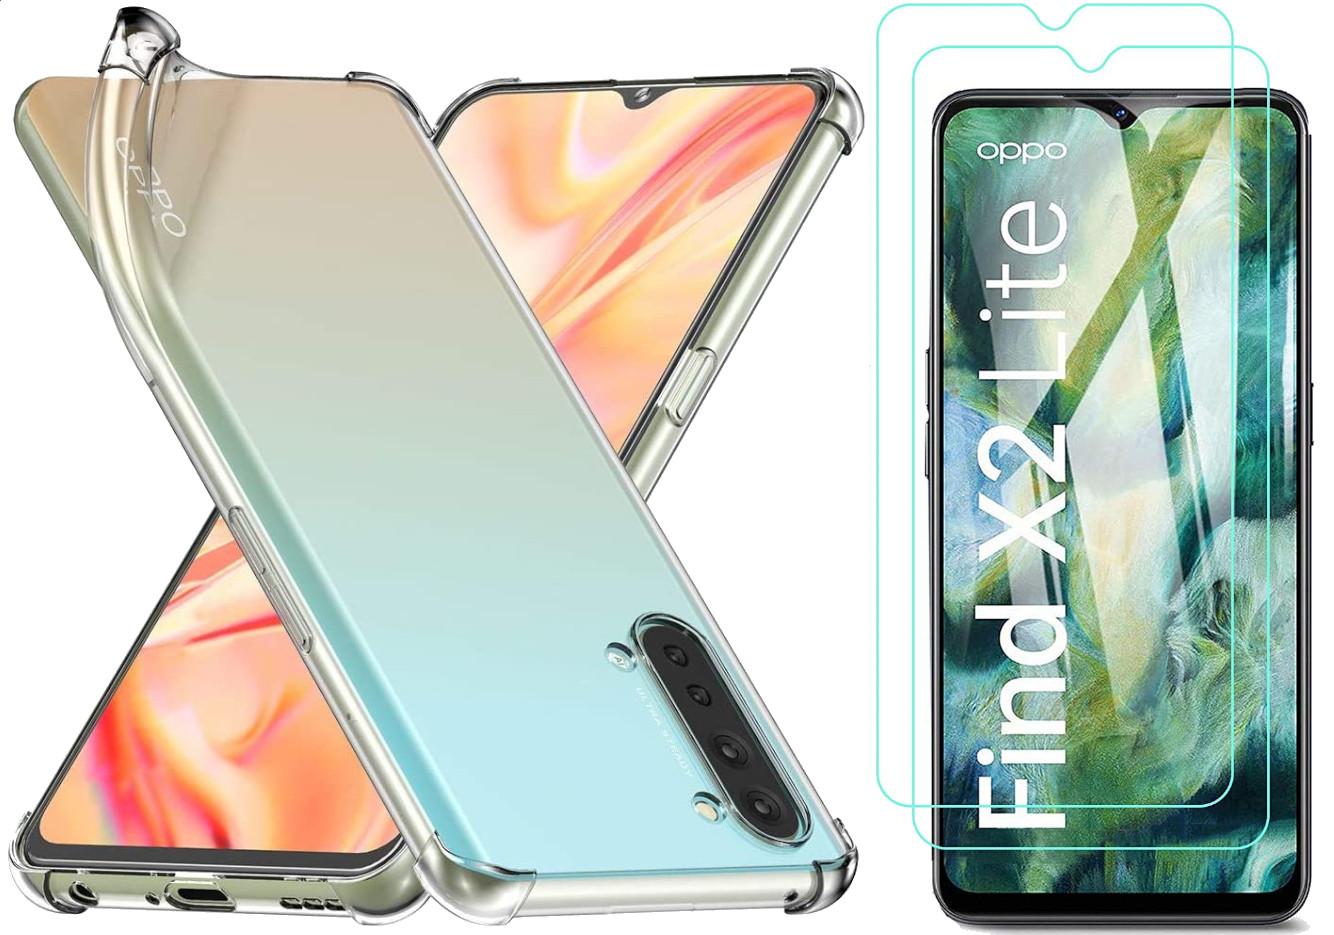 Coque Silicone TPU Transparente Angles Renforces + 2 Verres Trempes Pour Oppo Find X2 Lite Little Boutik®